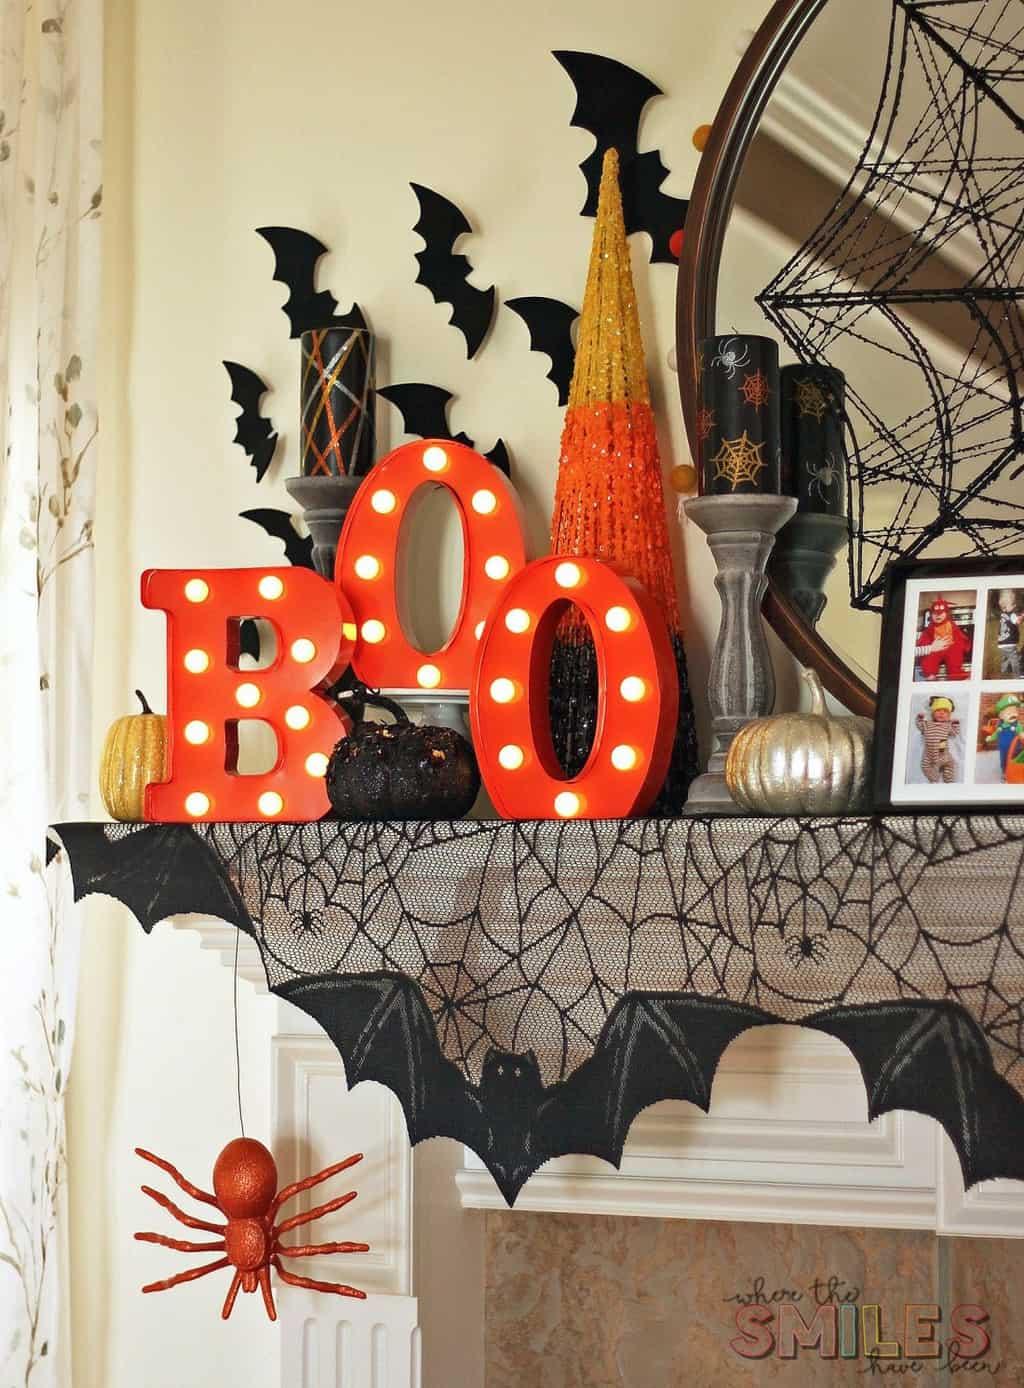 DIY Halloween Candles Using Vinyl